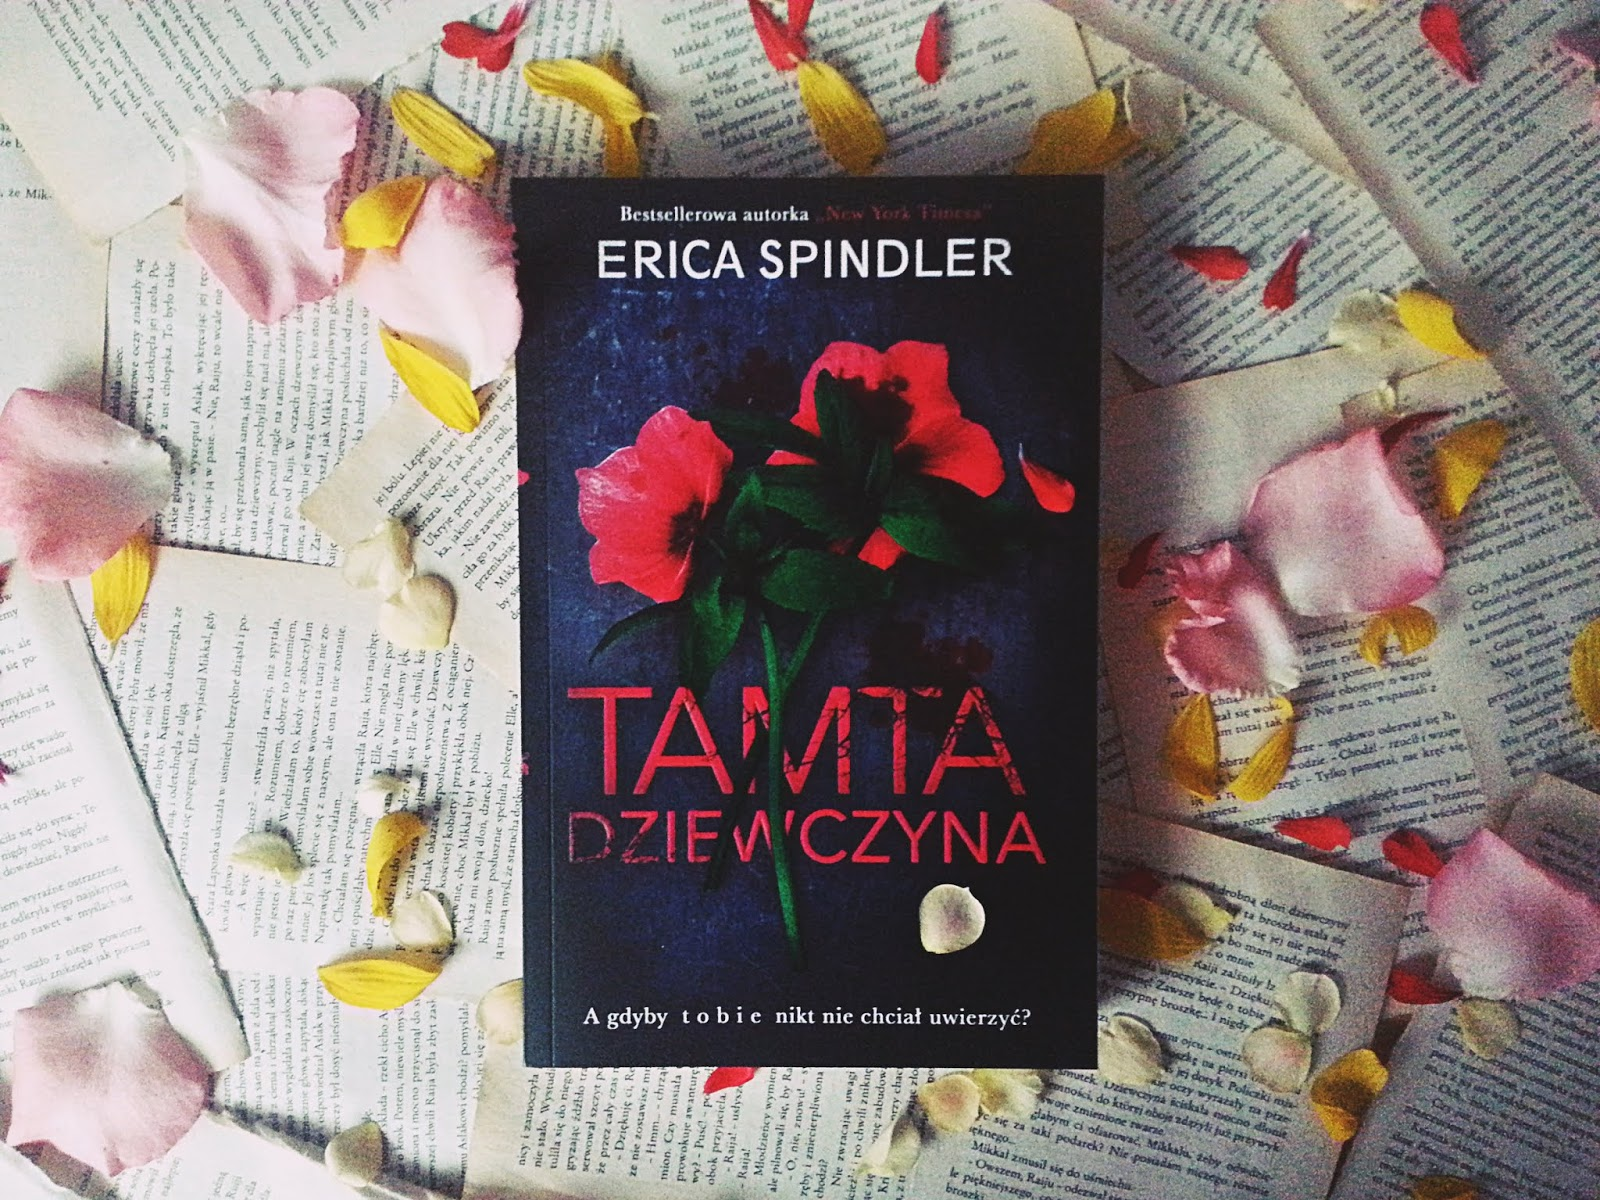 Tamta dziewczyna, The Other Girl, Erica Spindler, książka, recenzja, Edipresse Ksiązki